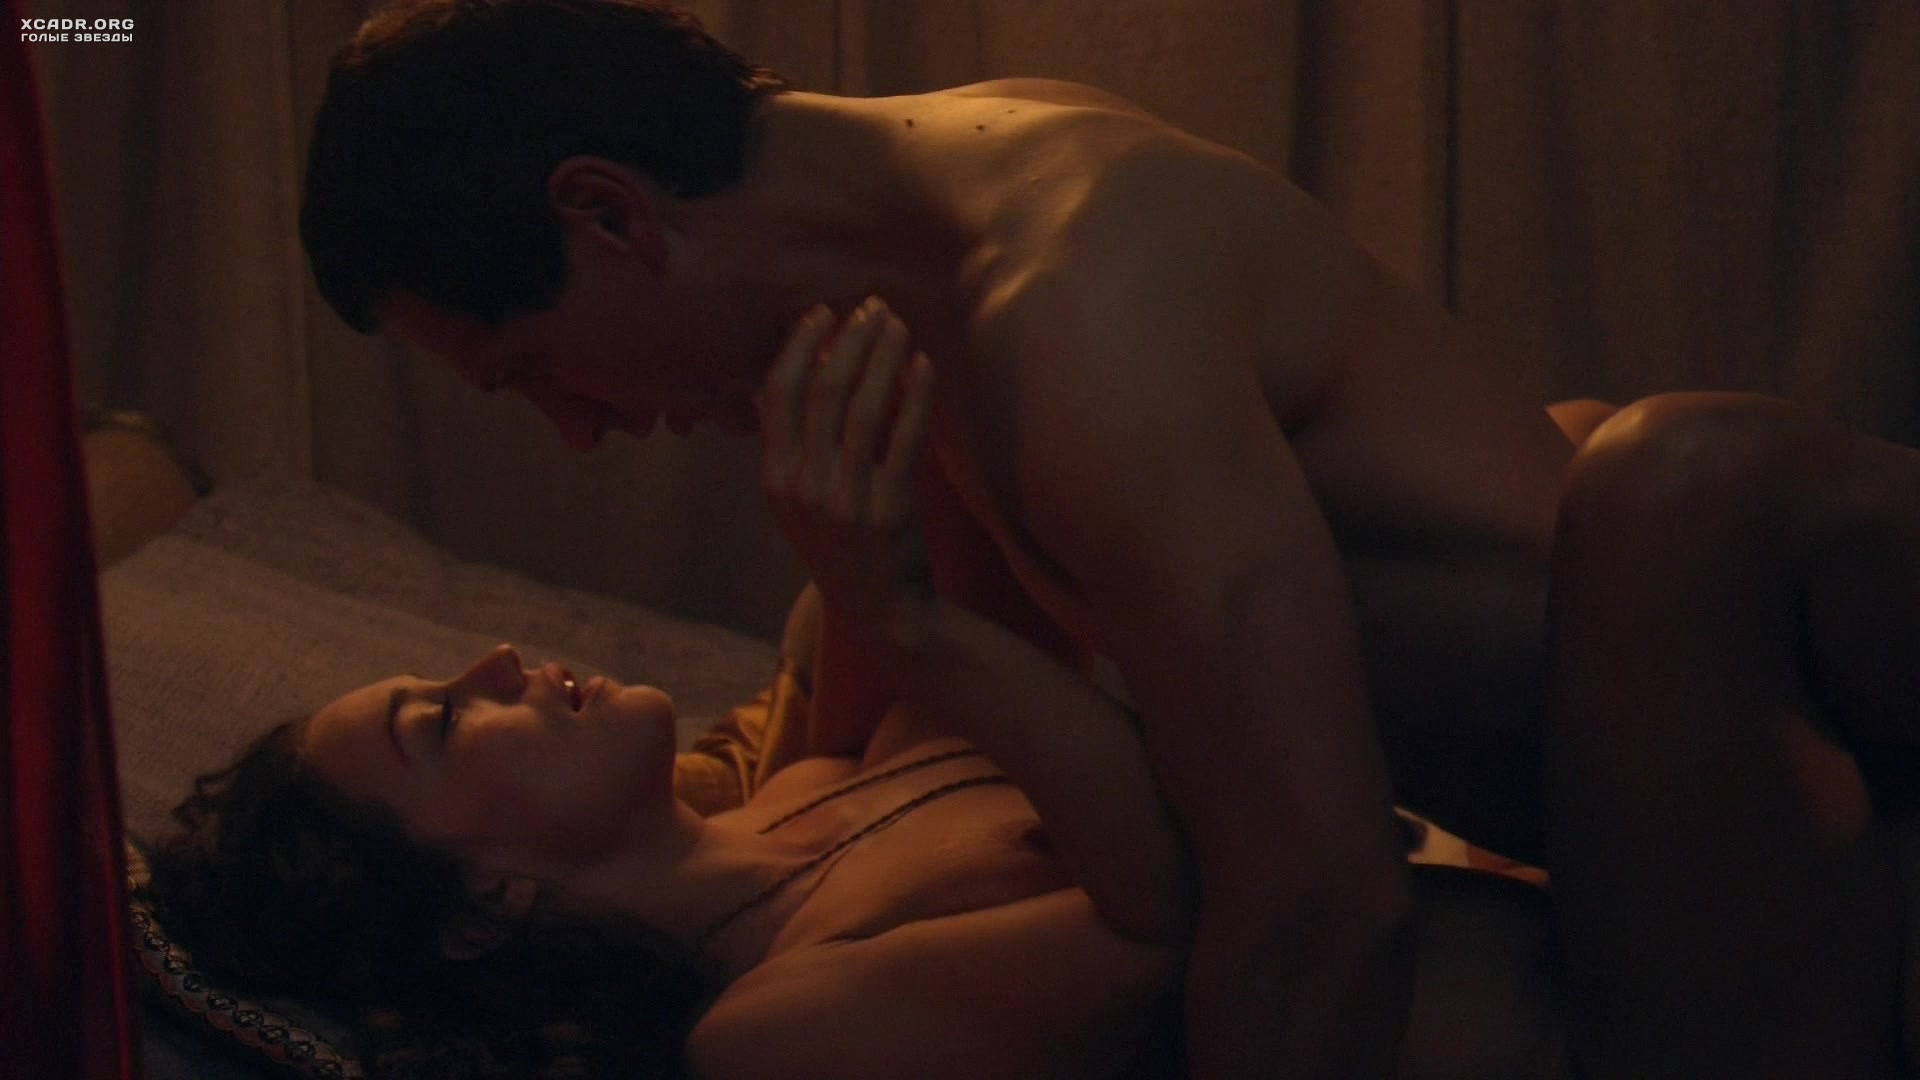 filmi-gde-est-porno-stseni